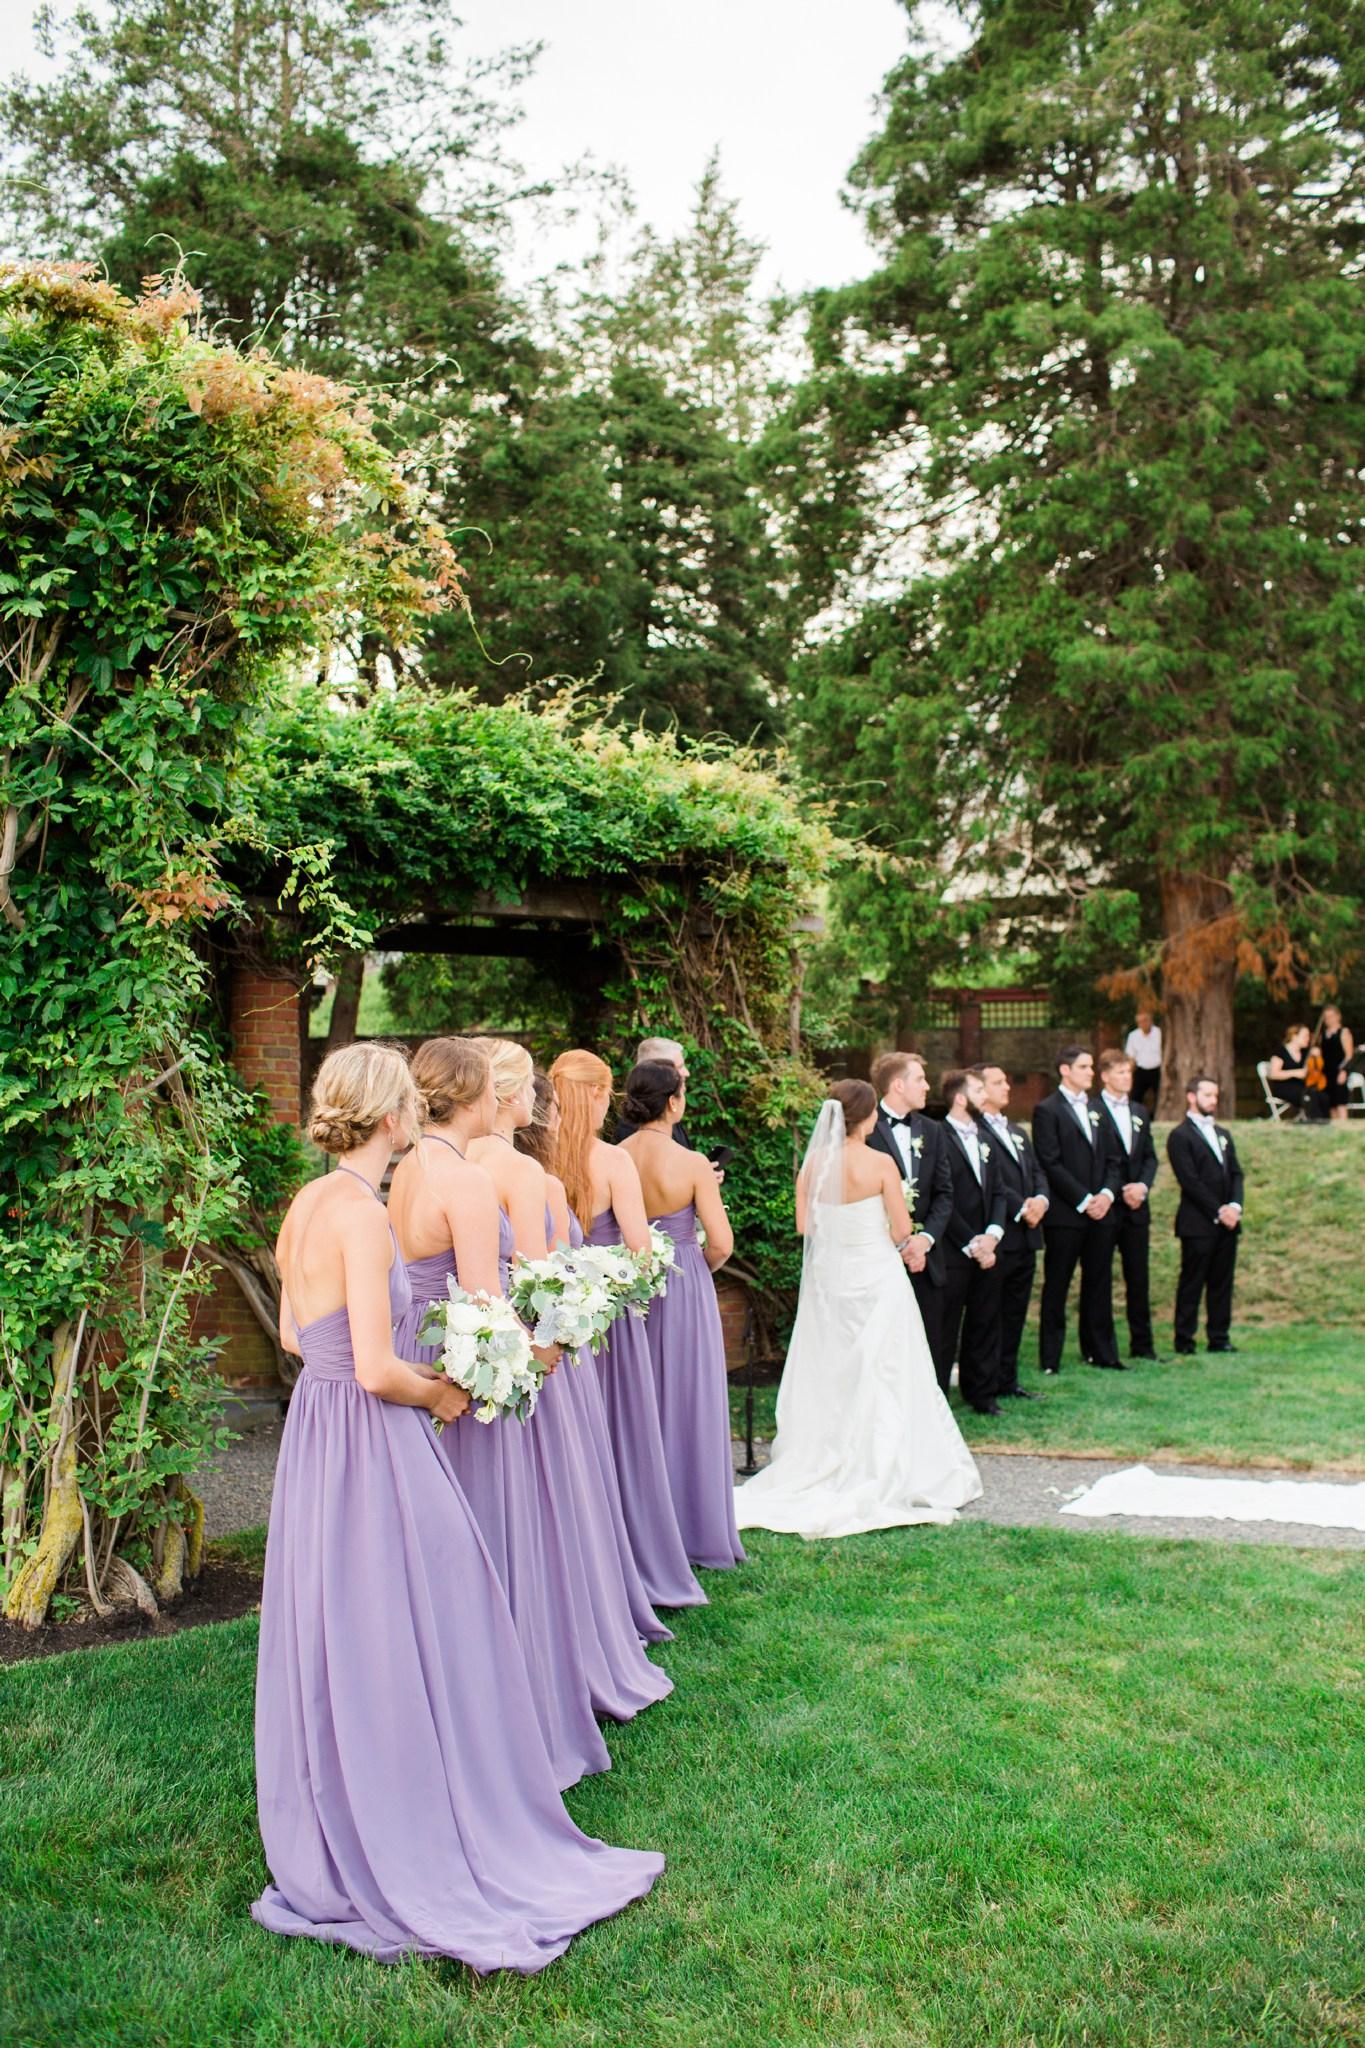 turner_hill_wedding_photos_00035.JPG